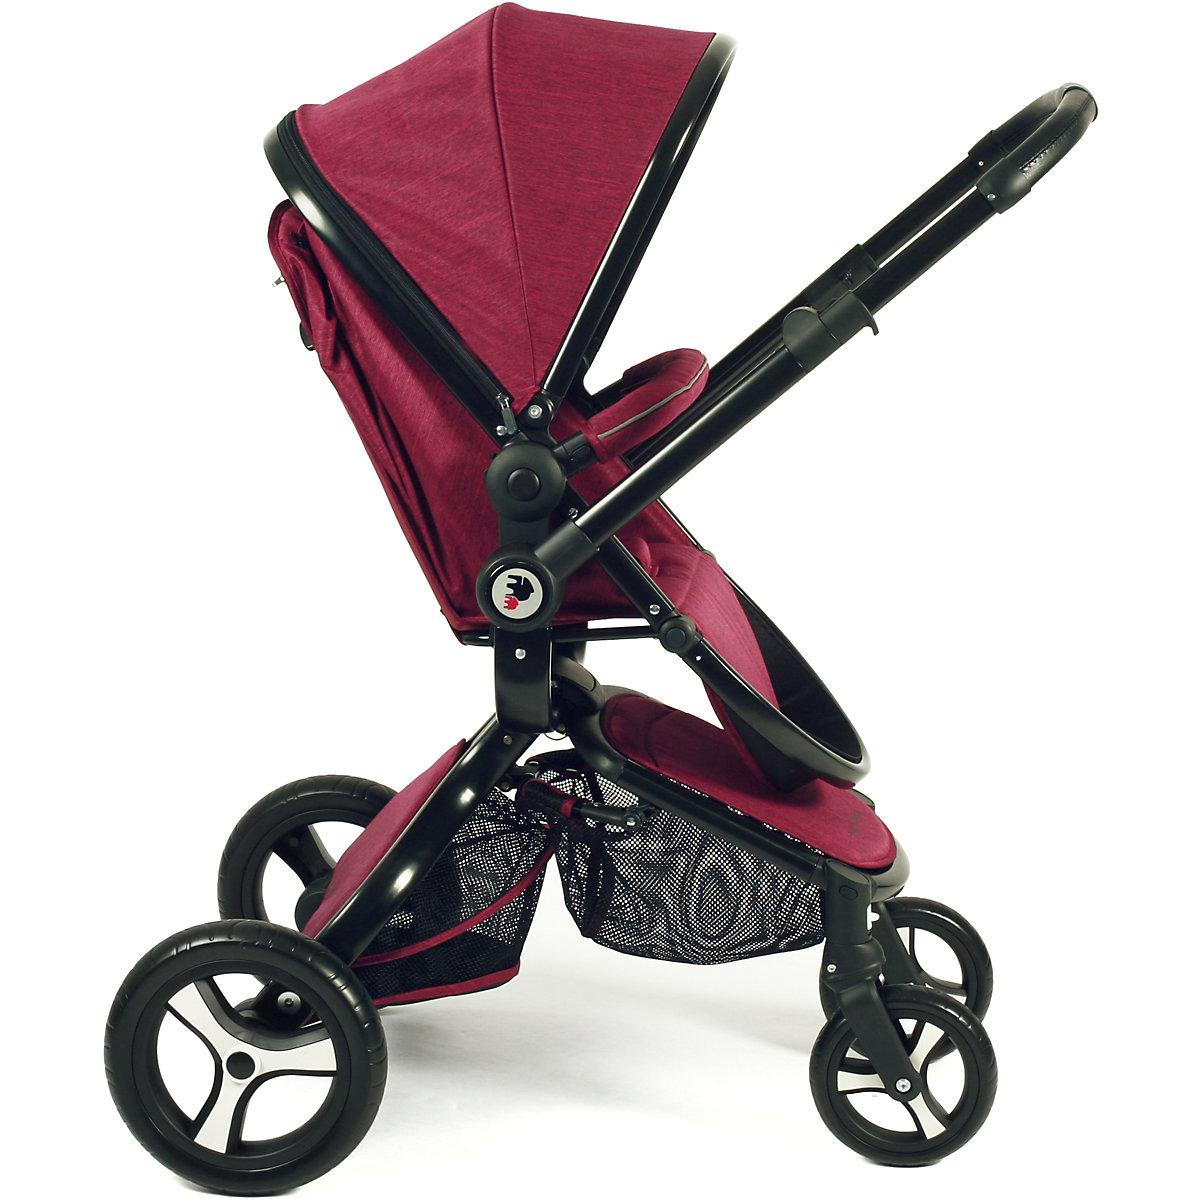 kombi kinderwagen platino jeans rose red 2018 chic 4 baby mytoys. Black Bedroom Furniture Sets. Home Design Ideas